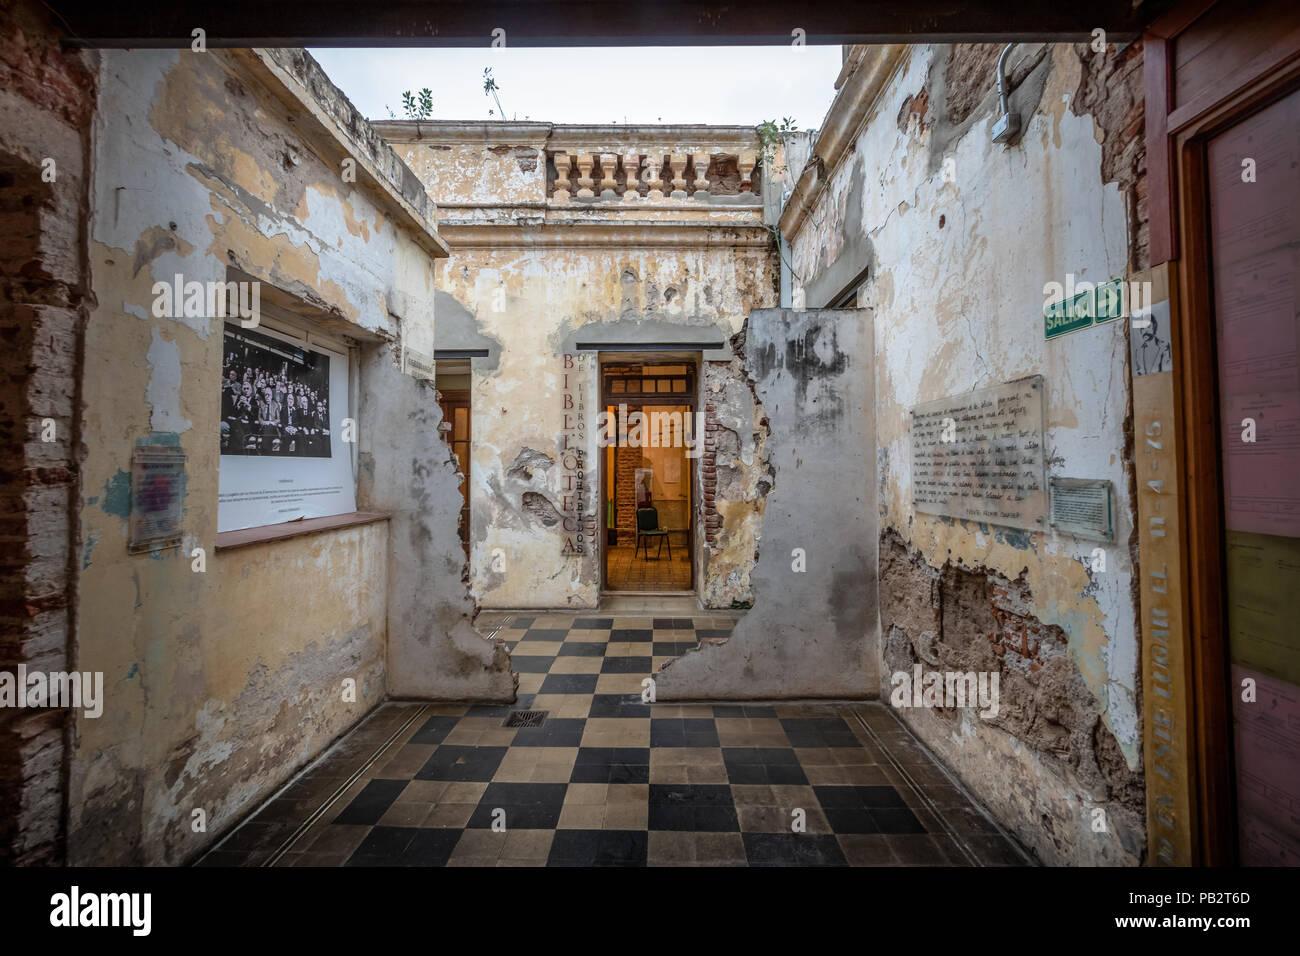 Museo de la Memoria (Museum of Memory) former detention and torture center - Cordoba, Argentina - Stock Image